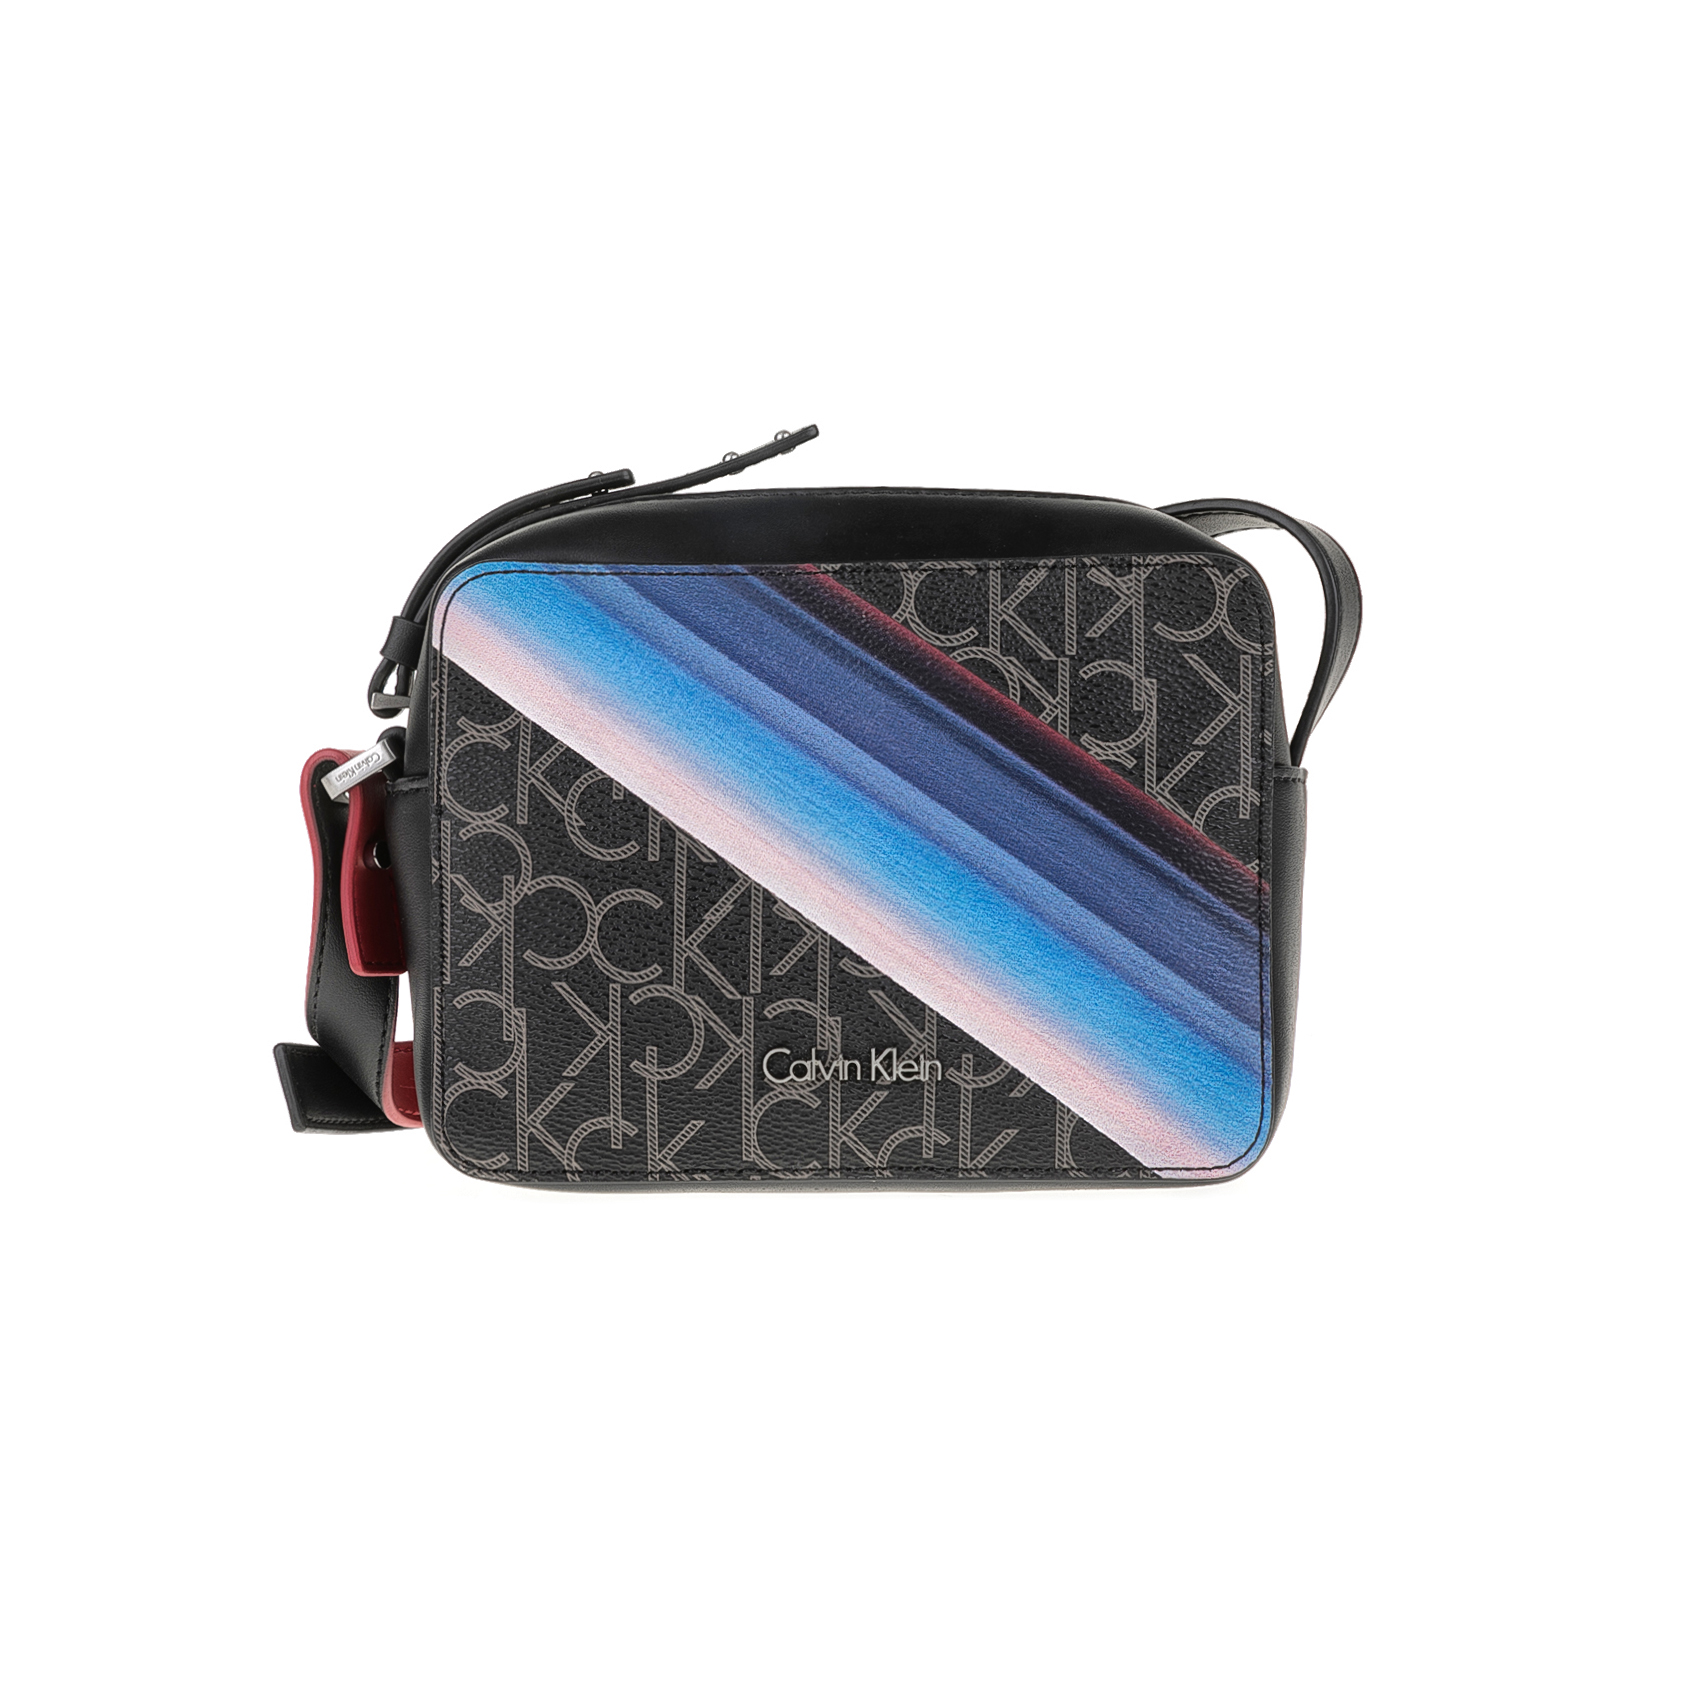 CALVIN KLEIN JEANS - Γυναικεία τσάντα TIN4 SMALL γυναικεία αξεσουάρ τσάντες σακίδια ωμου